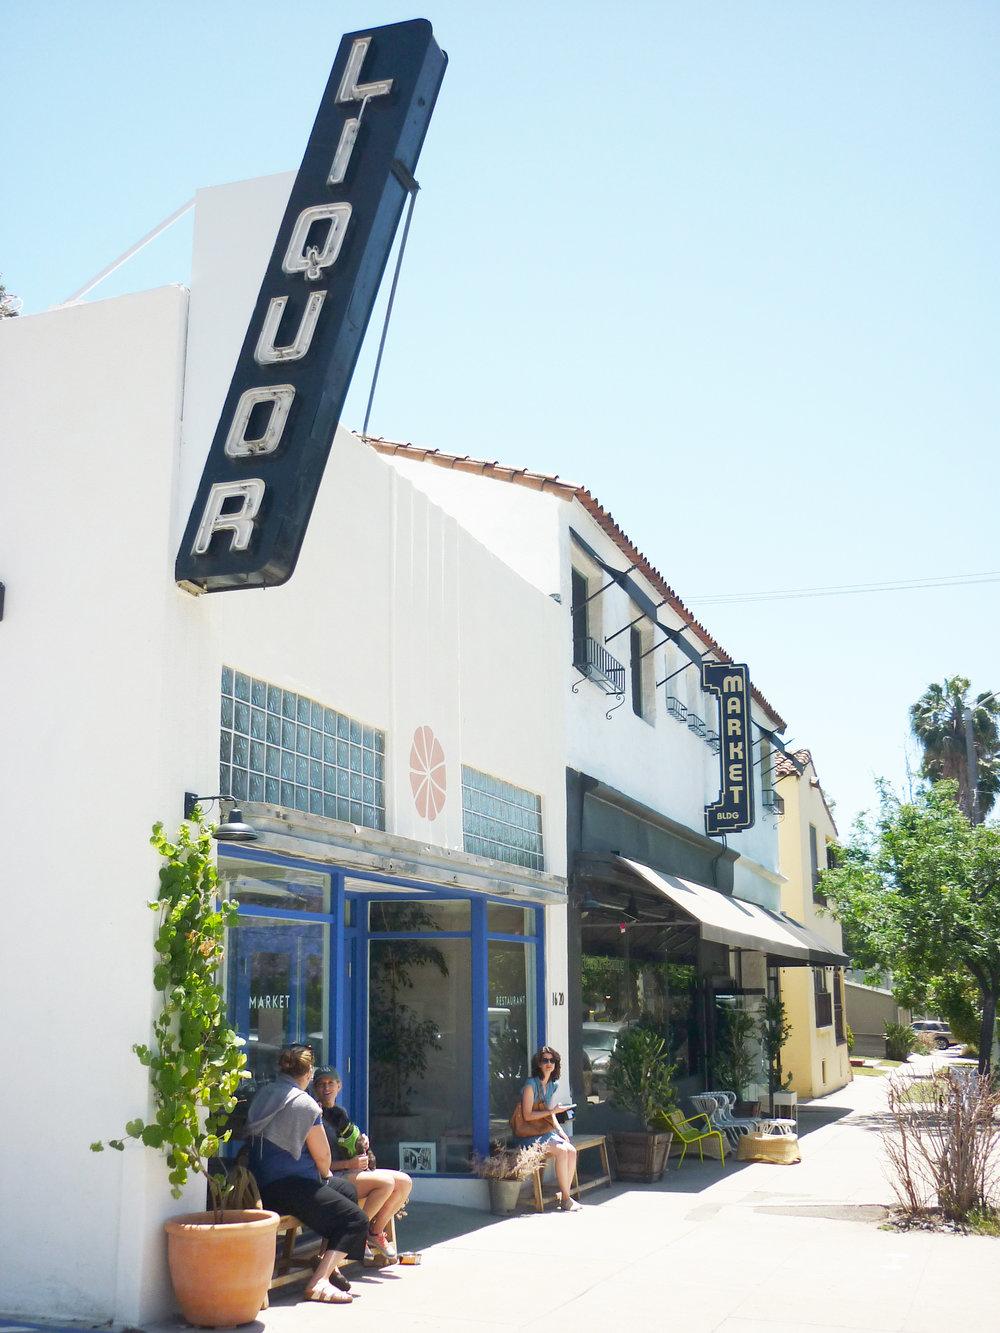 Silver Lake - City Guide Los Angeles - The LA Bliss